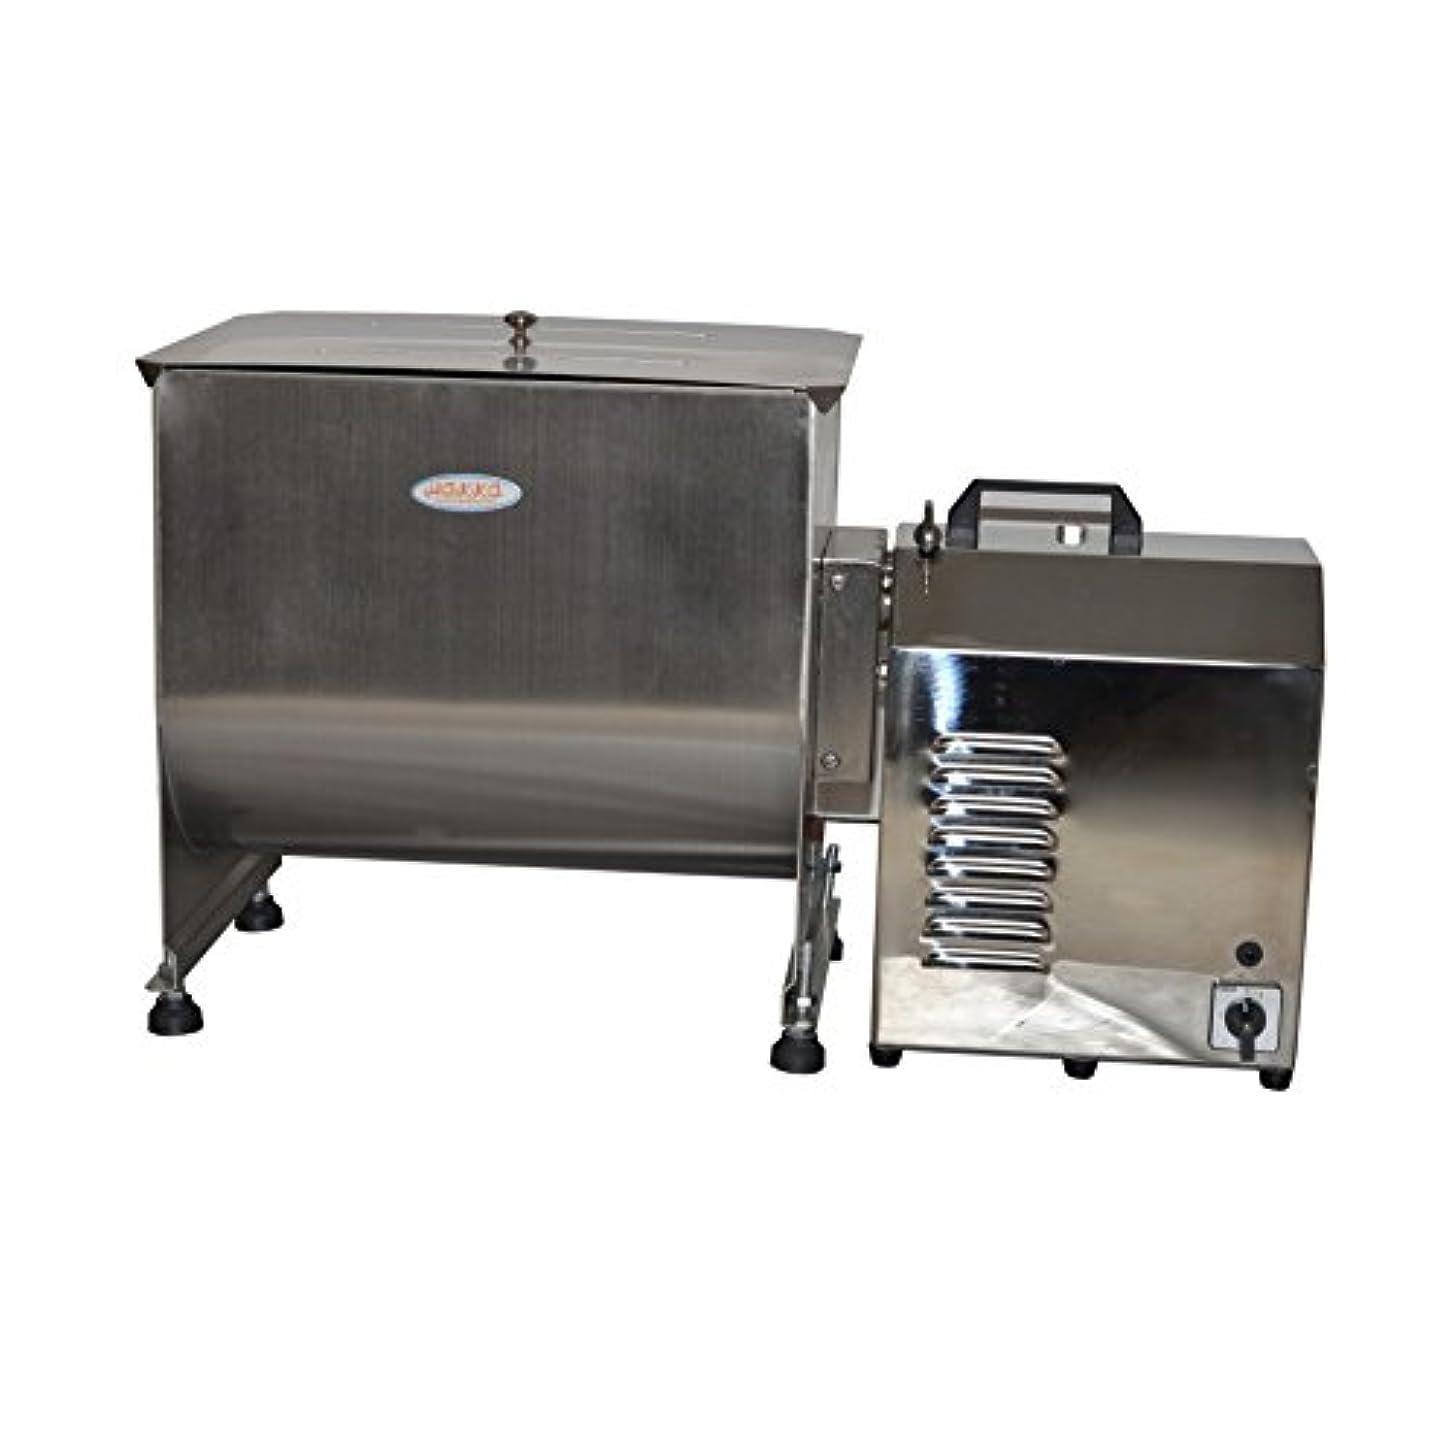 Hakka Electric 88 Lbs Tank Stainless Steel Meat Mixers (88Lbs)